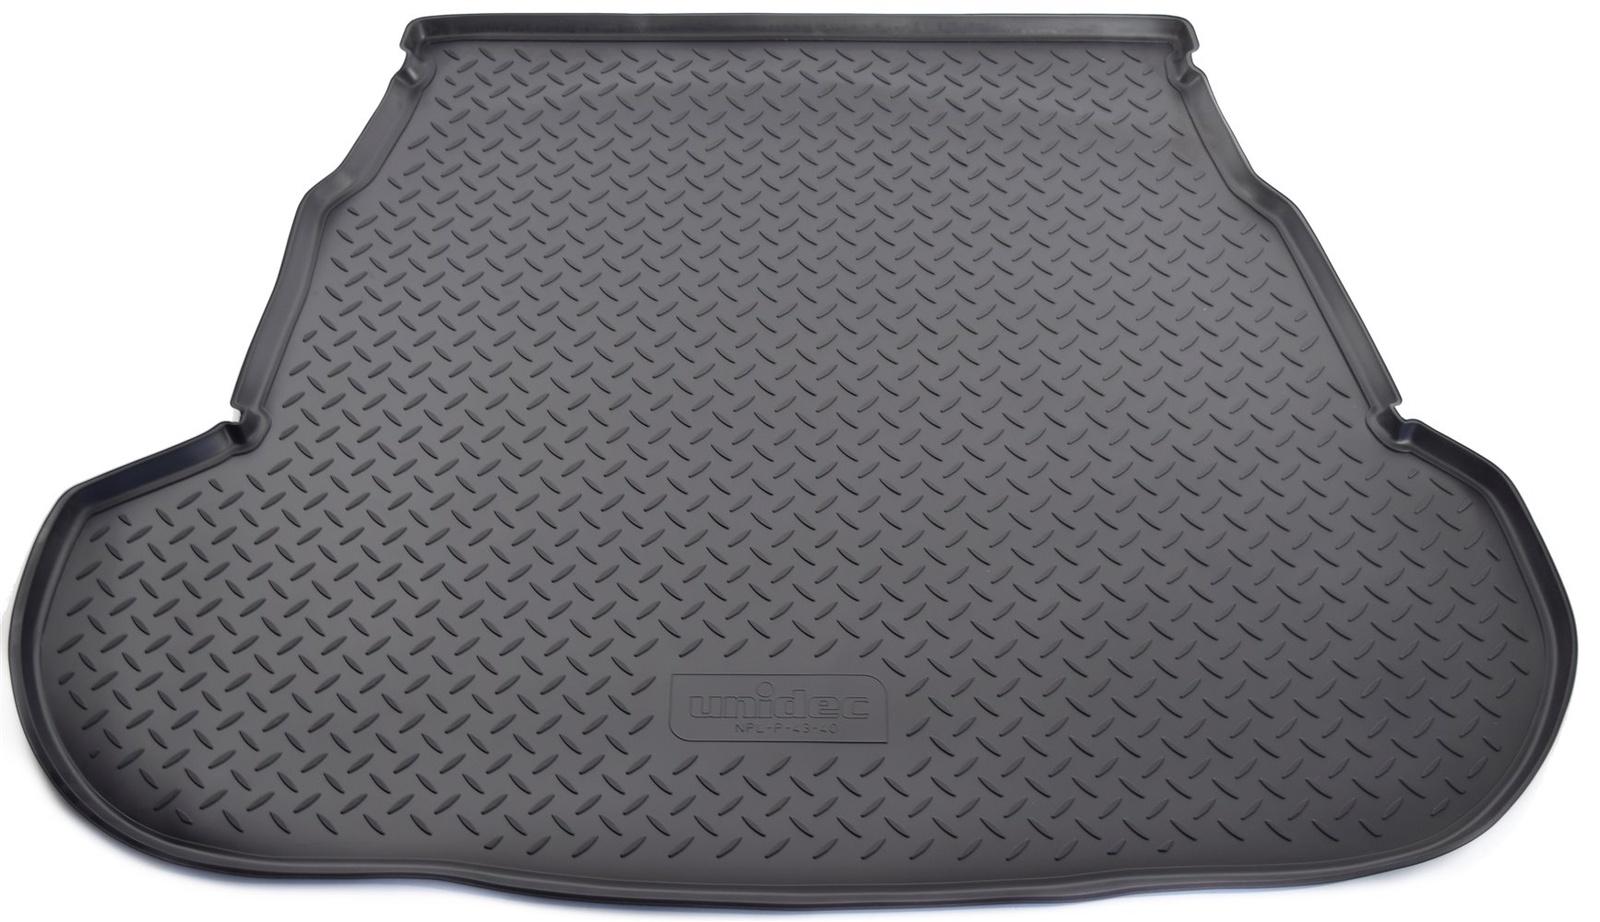 Коврик багажника Norplast для Kia Optima TF SD 2010, NPL-P-43-40, черный